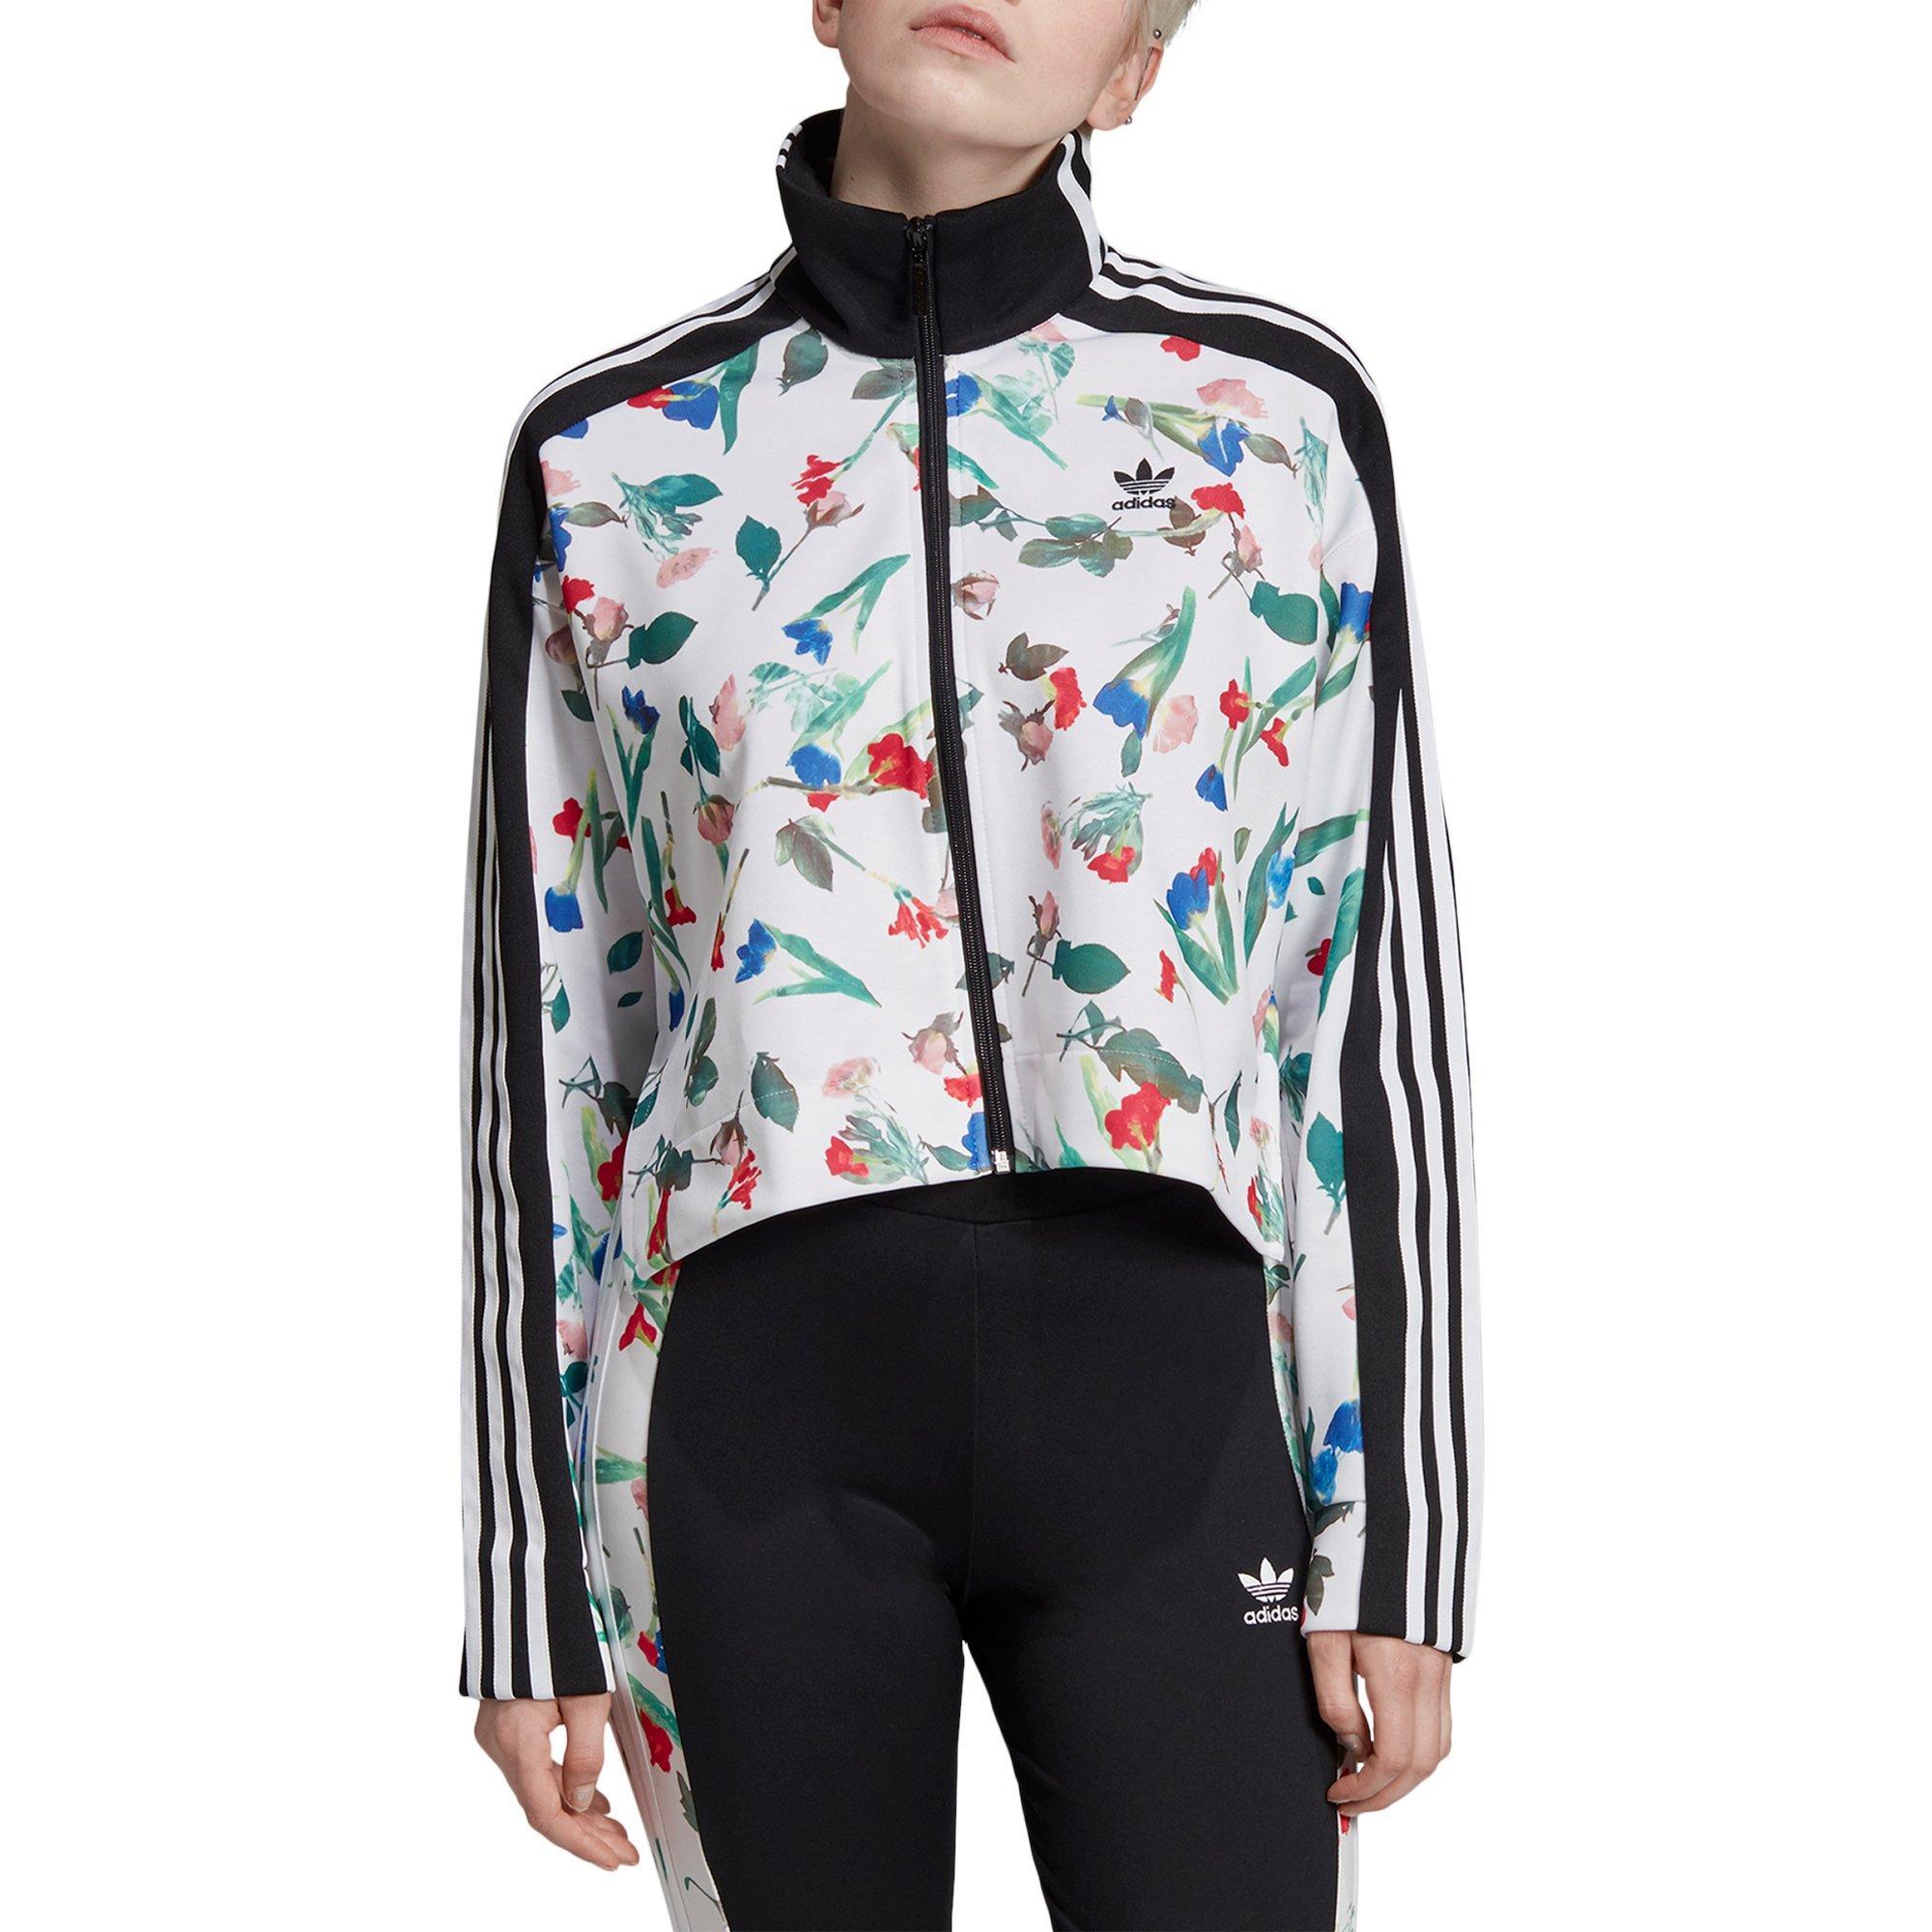 borde hogar Destello  adidas Women's Originals Floral Bomber - Hibbett | City Gear